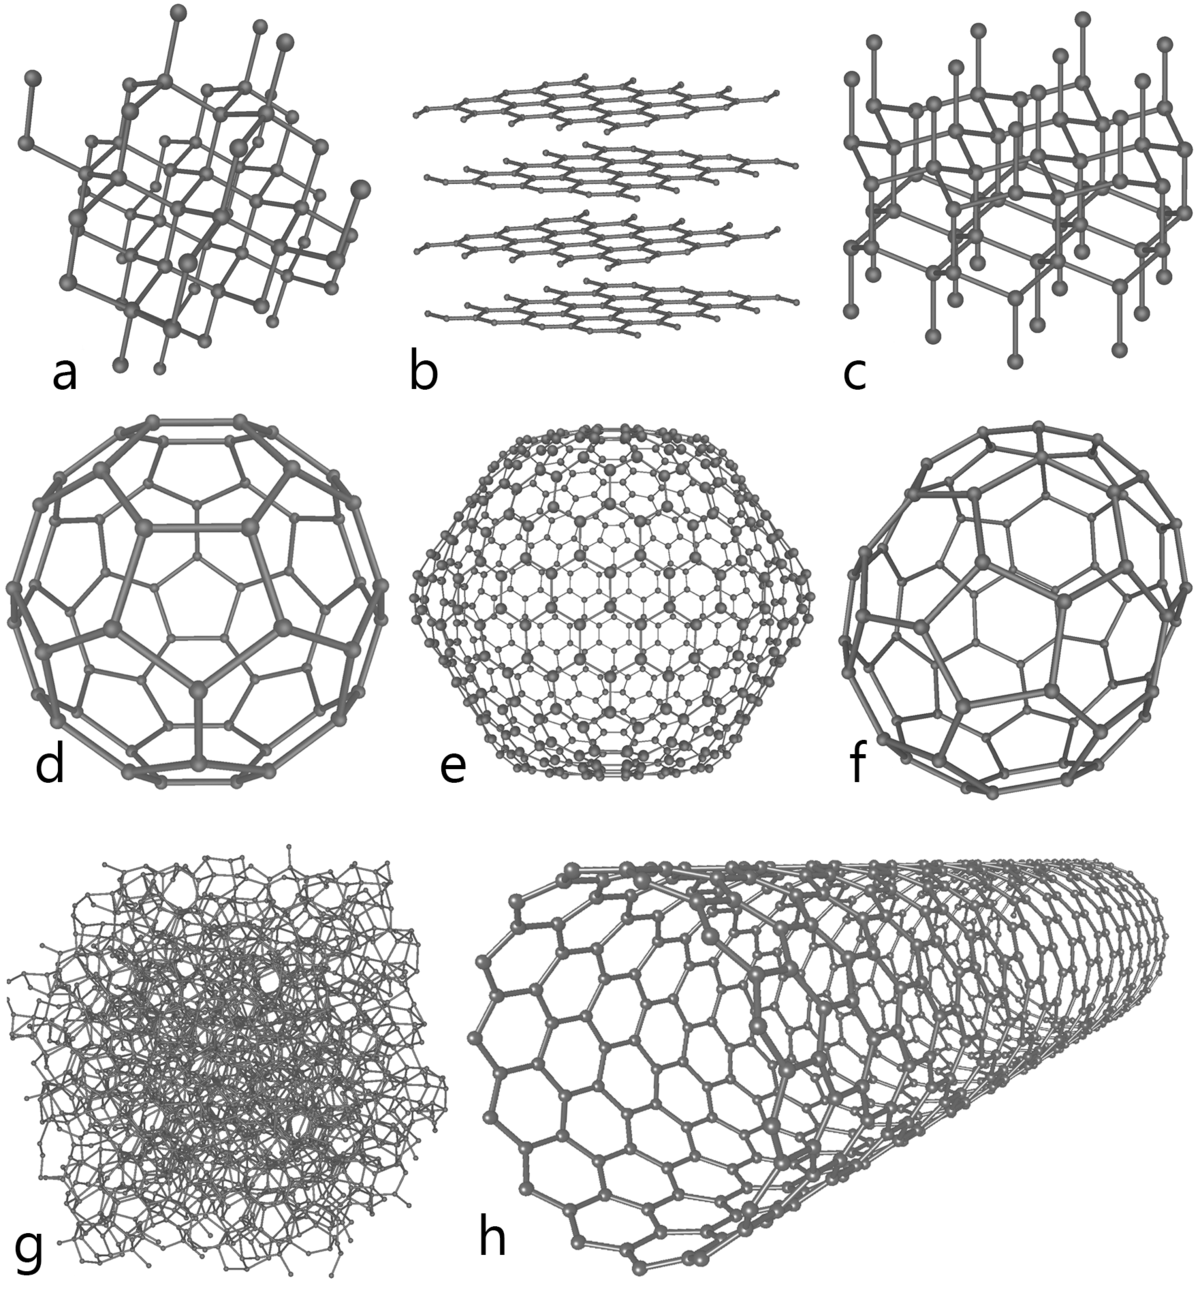 Allotropes of carbon - Wikipedia